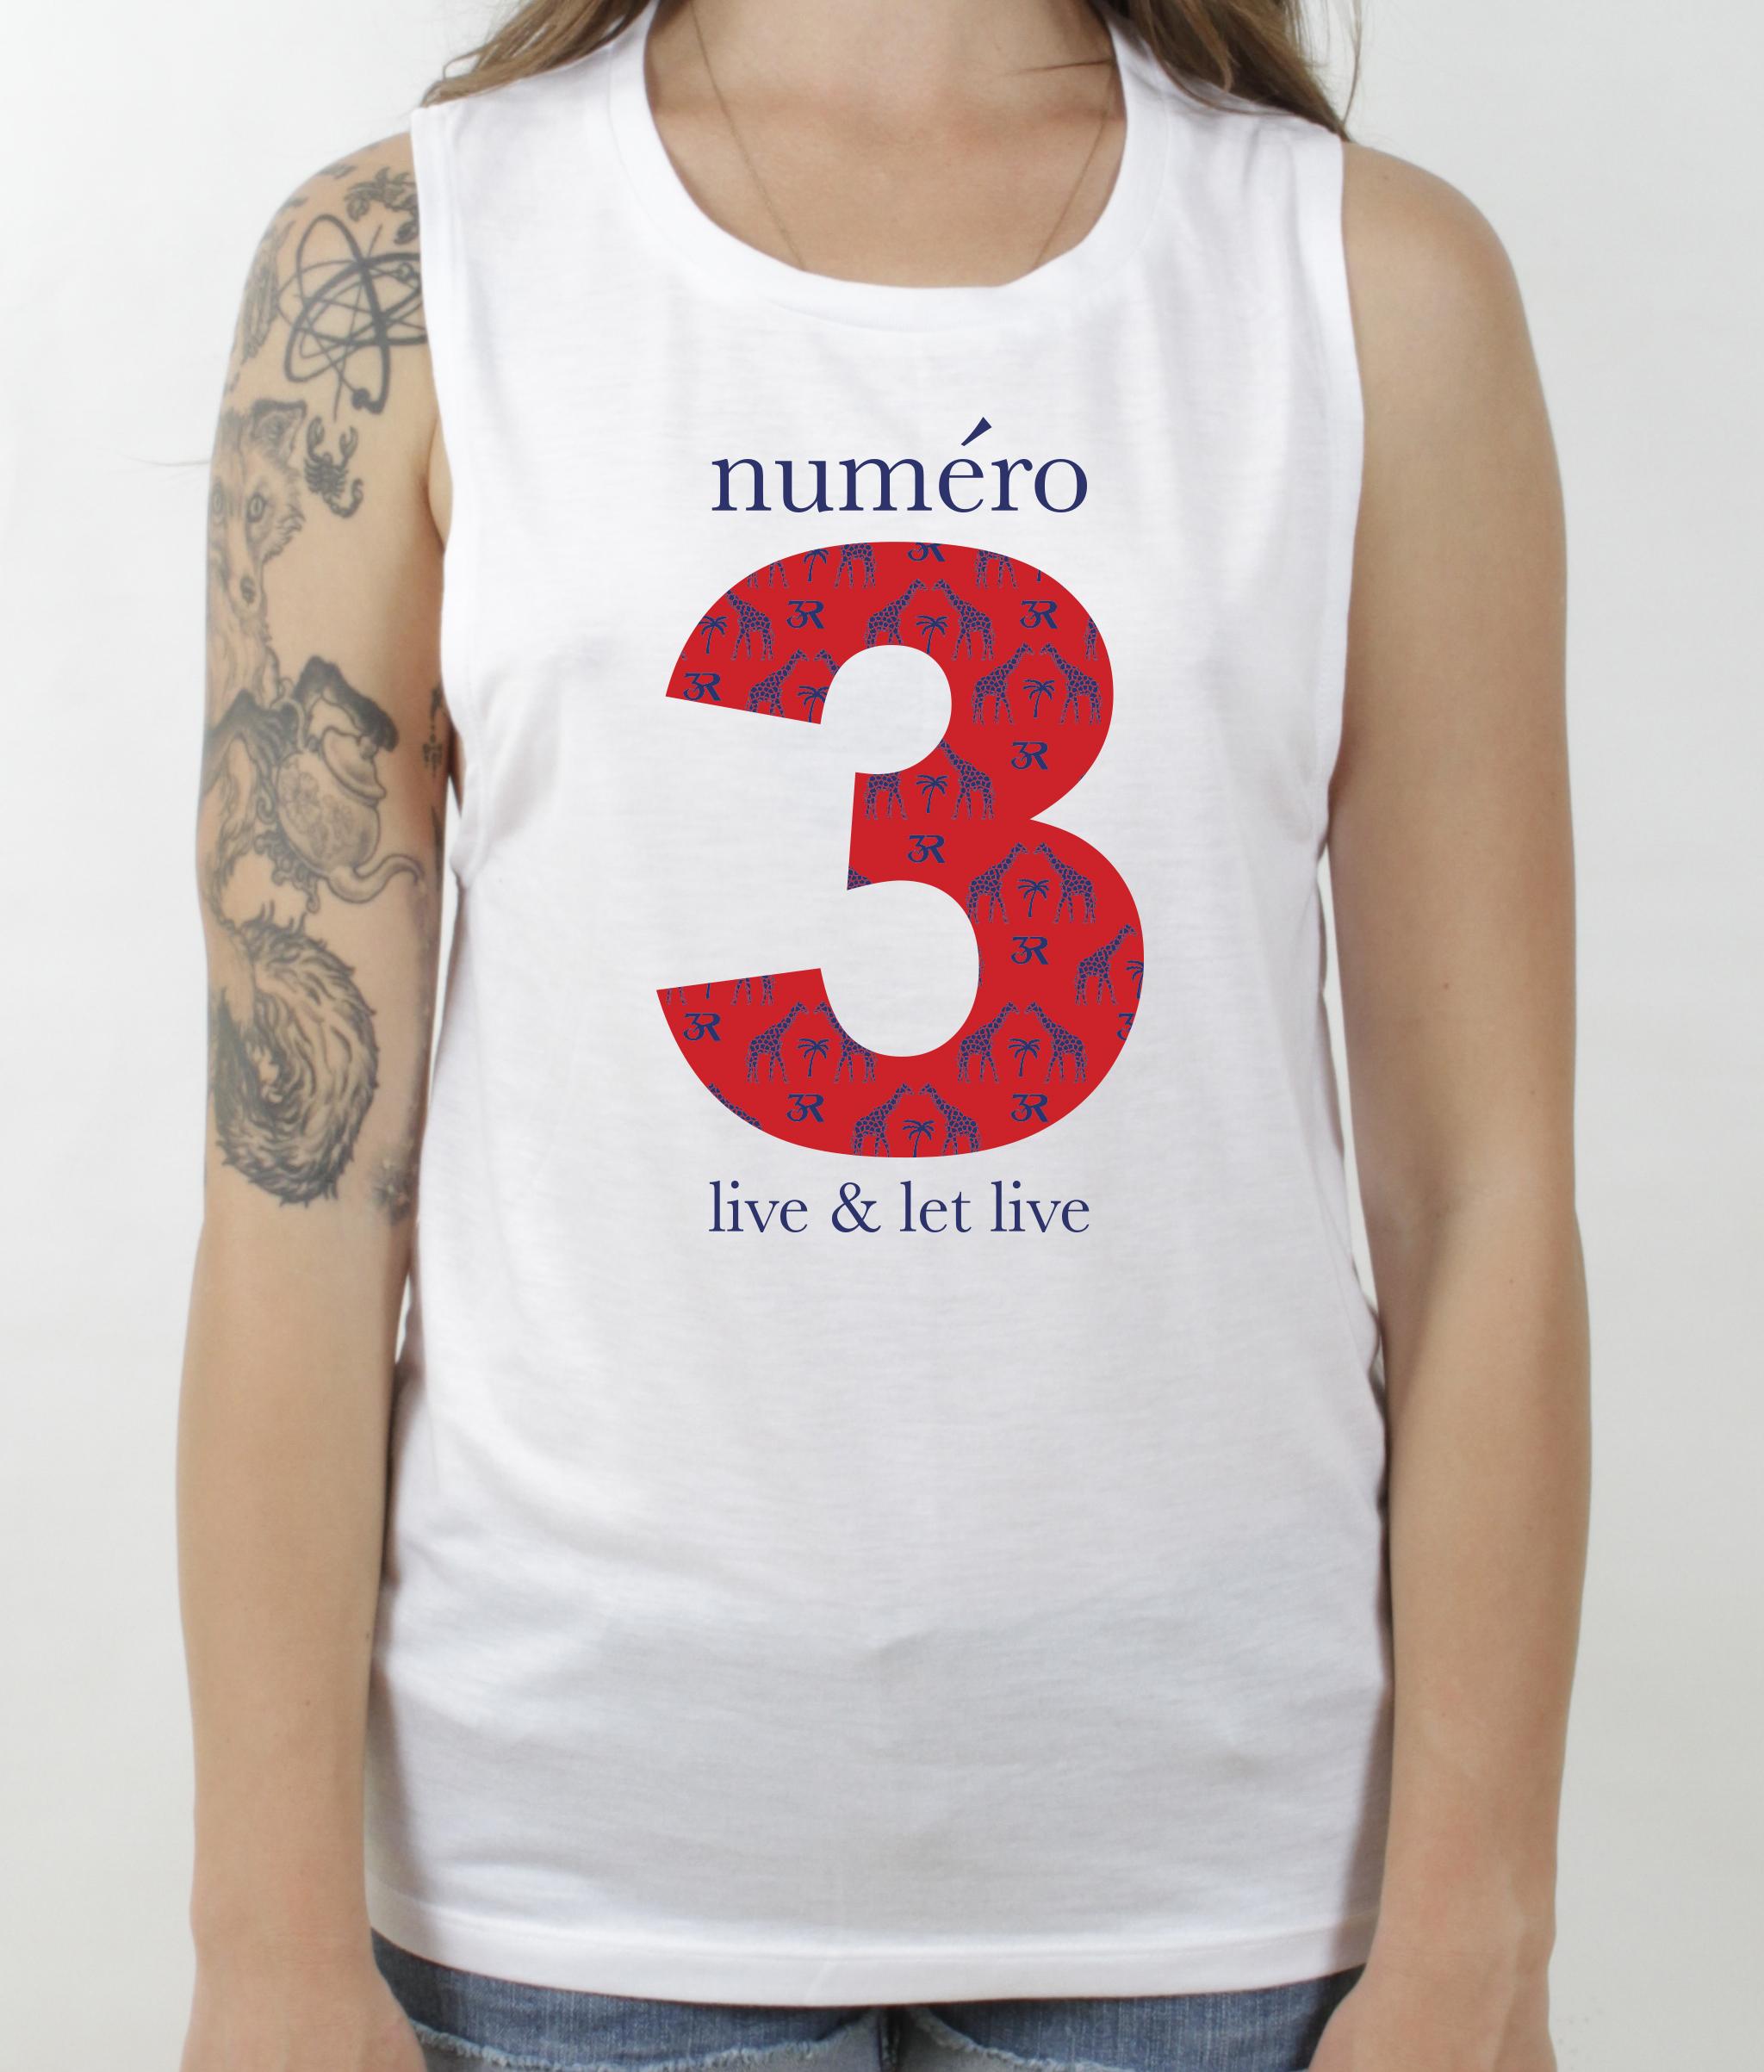 tres_num3_front